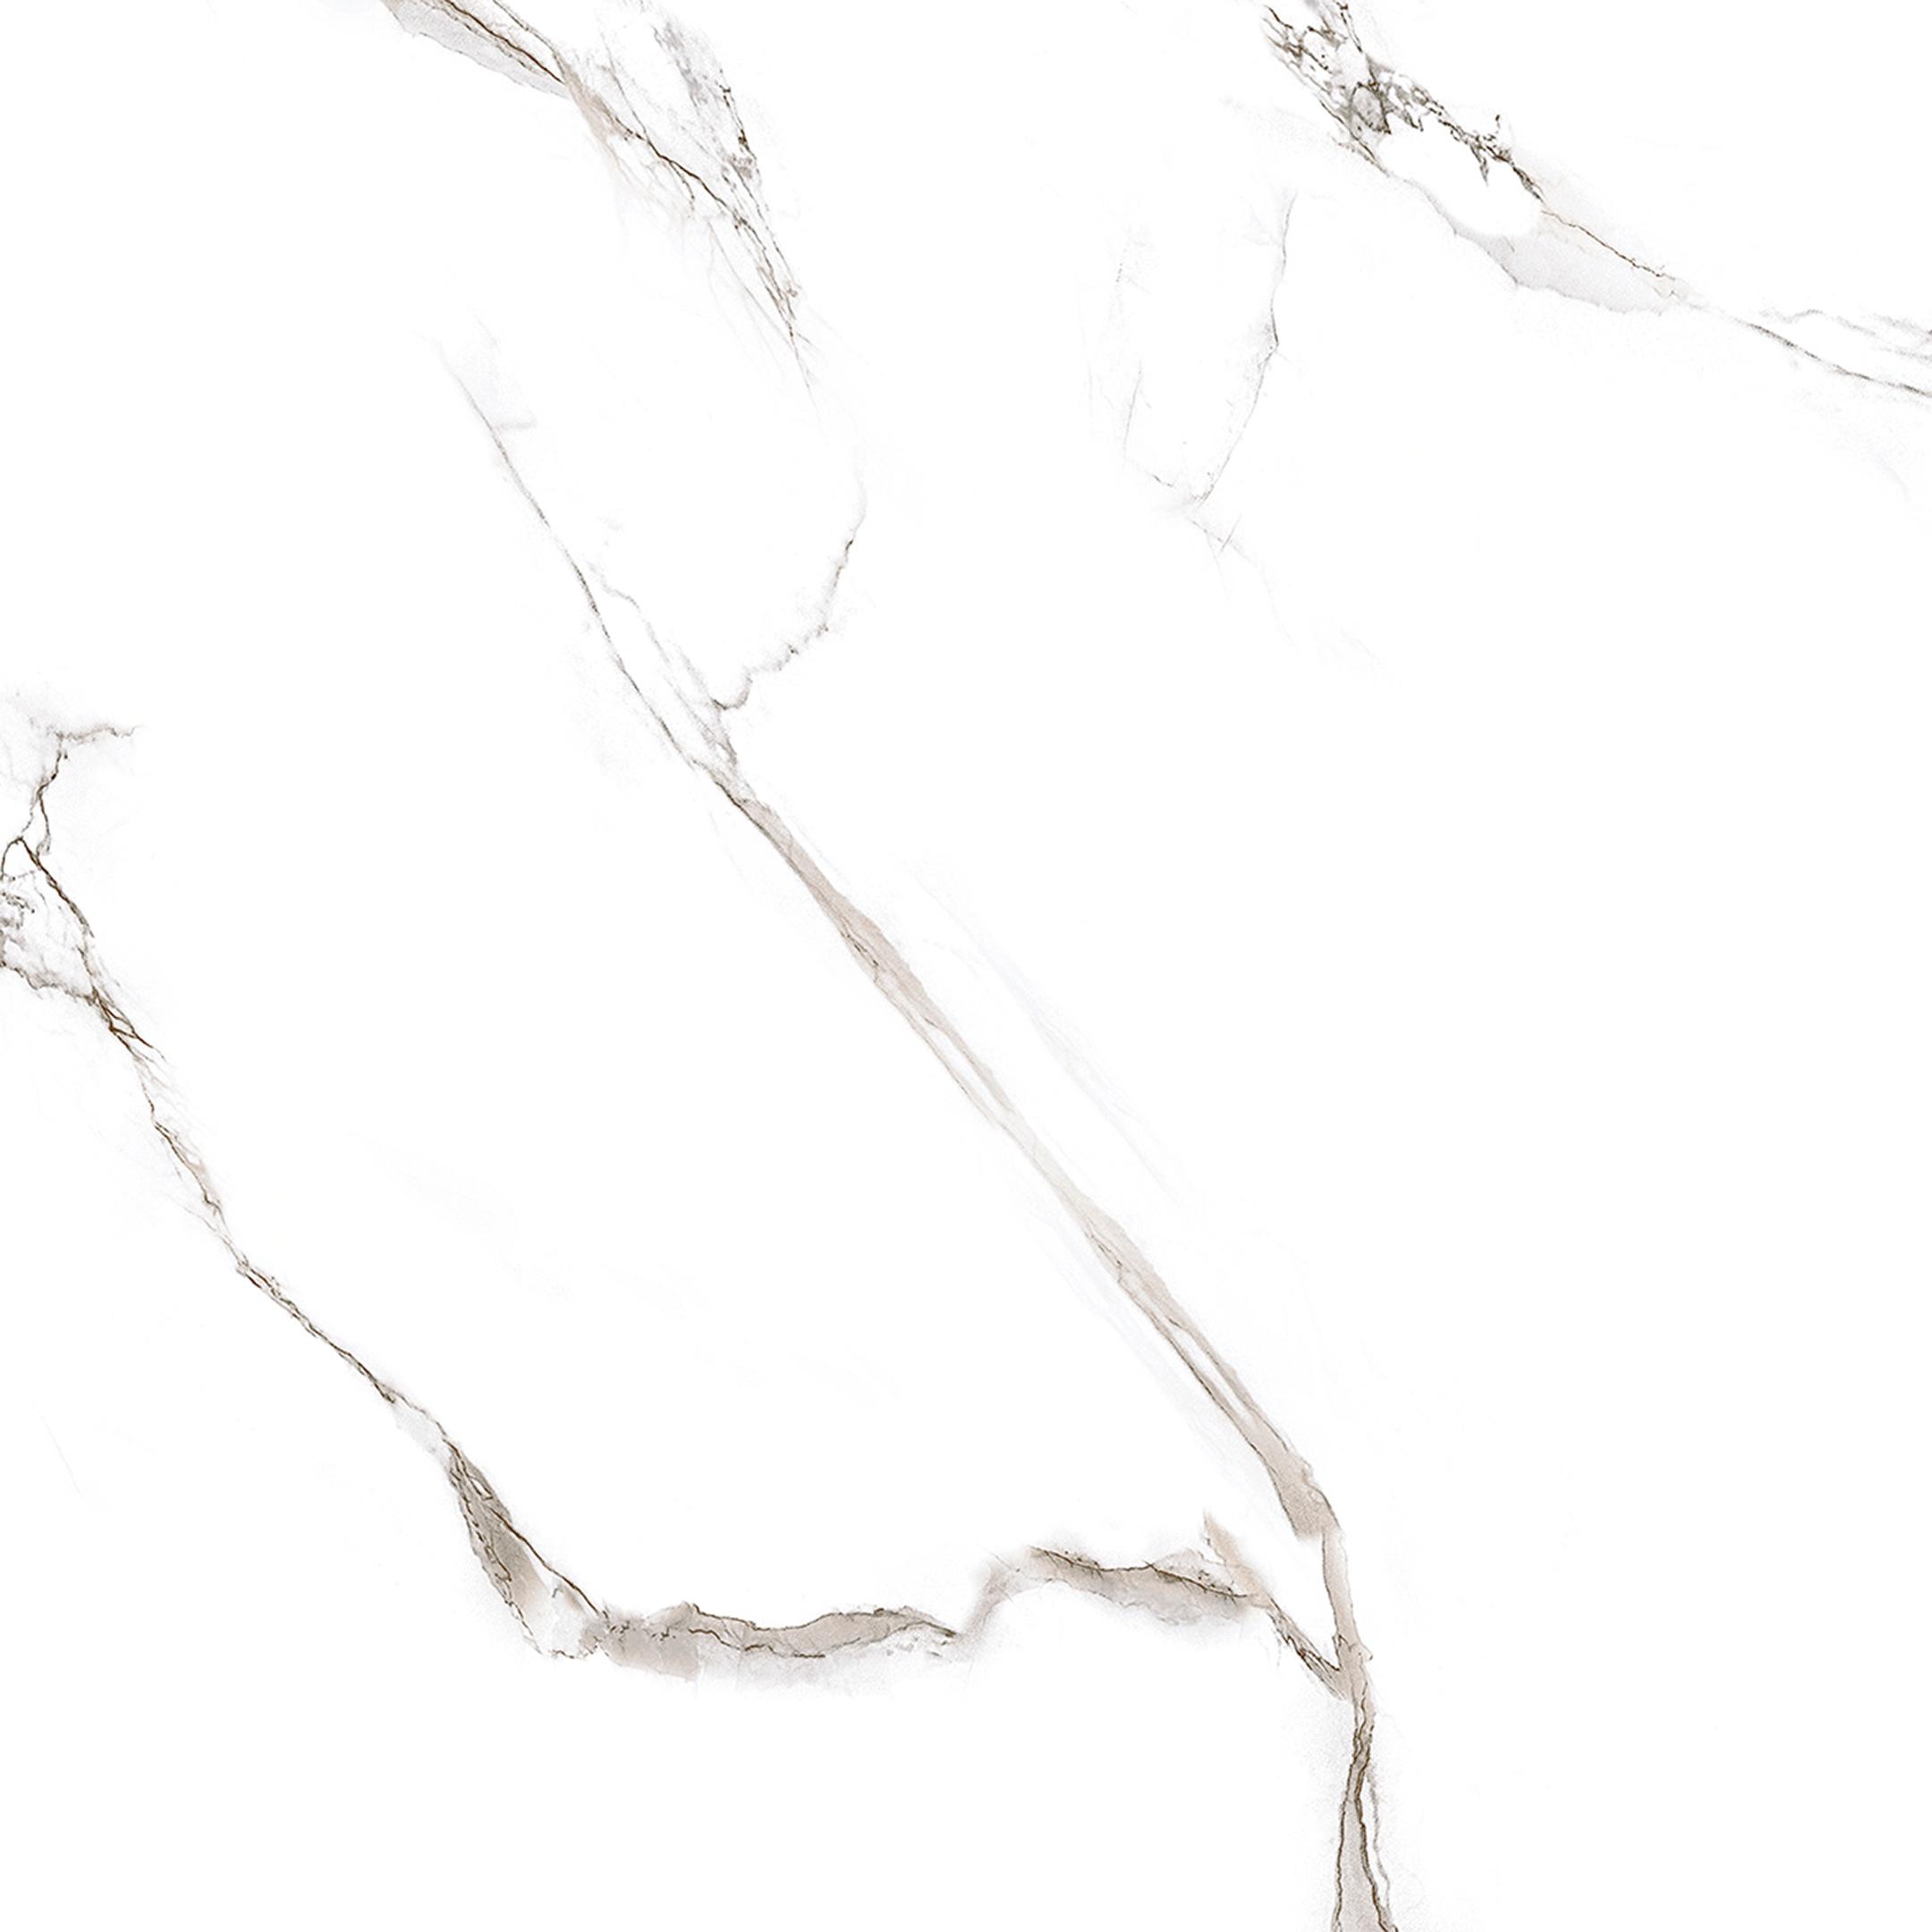 Керамогранит GRASARO Classic Marble белый 400х400х8 мм (10 шт.) grasaro marble classic snow white gt 270 d02 40x40